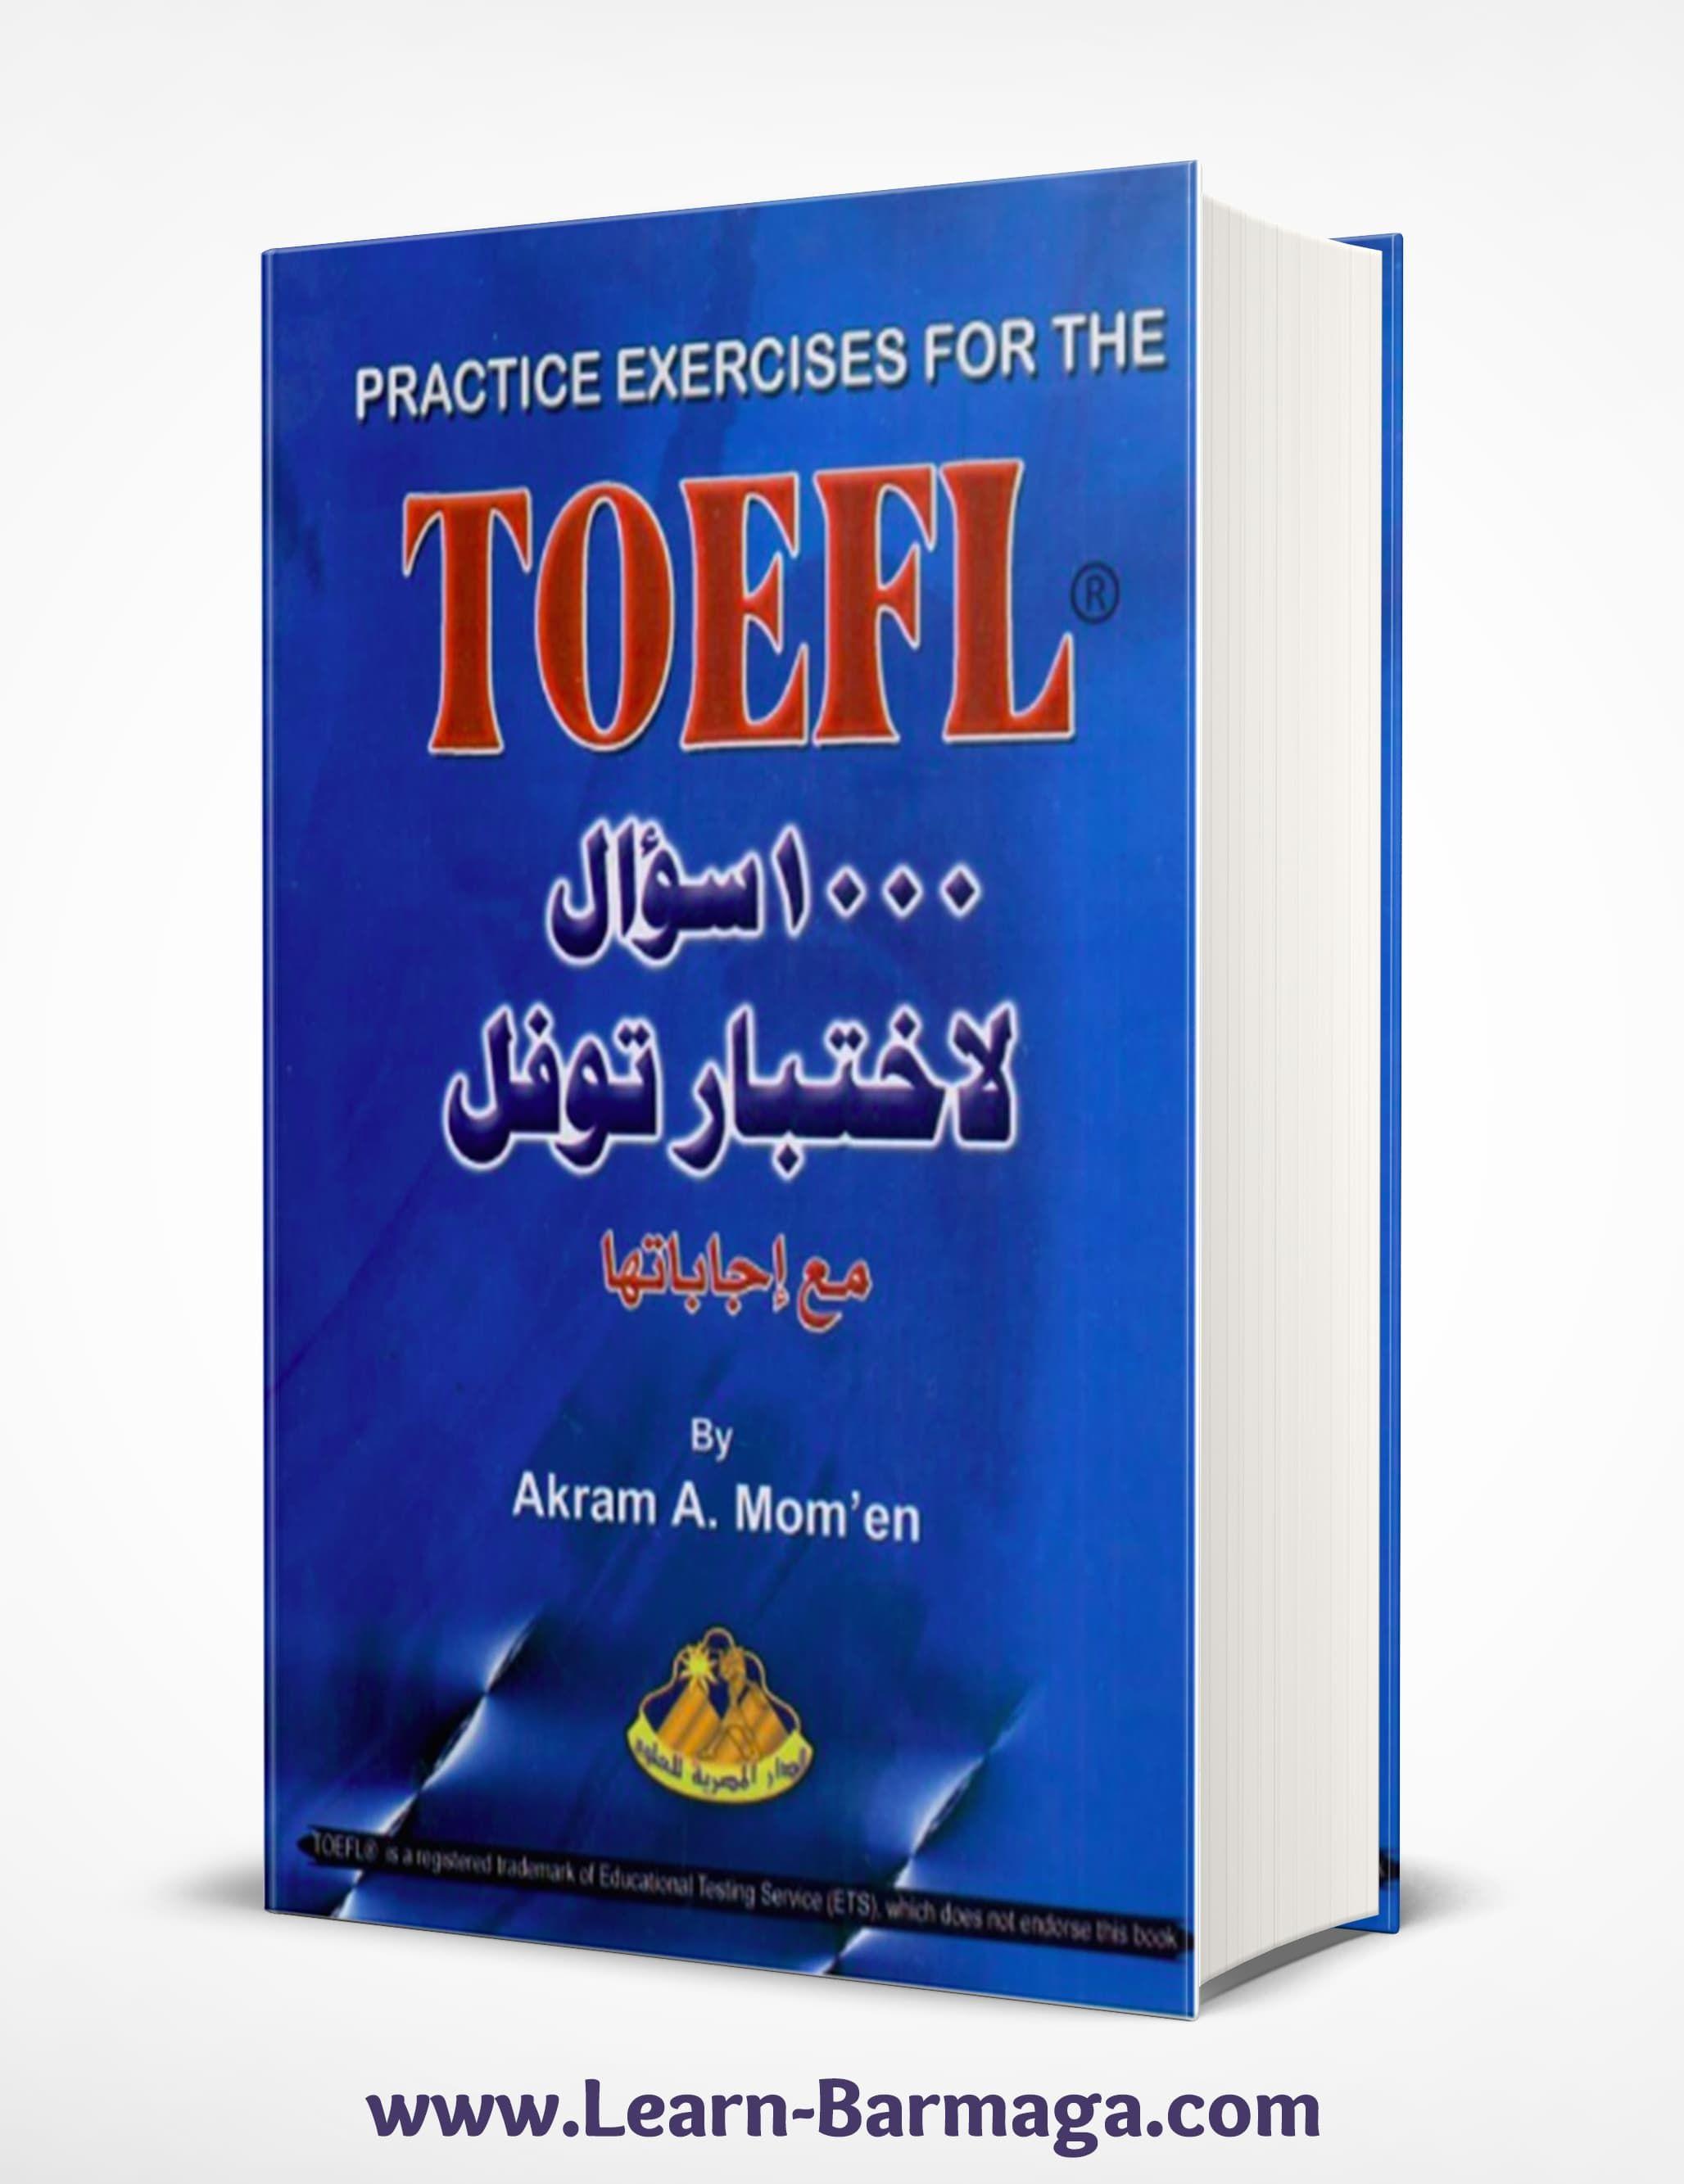 تحميل كتاب 1000 سؤال لاختبار توفل Toefl مع إجاباتها Pdf English Book English Lessons Learning